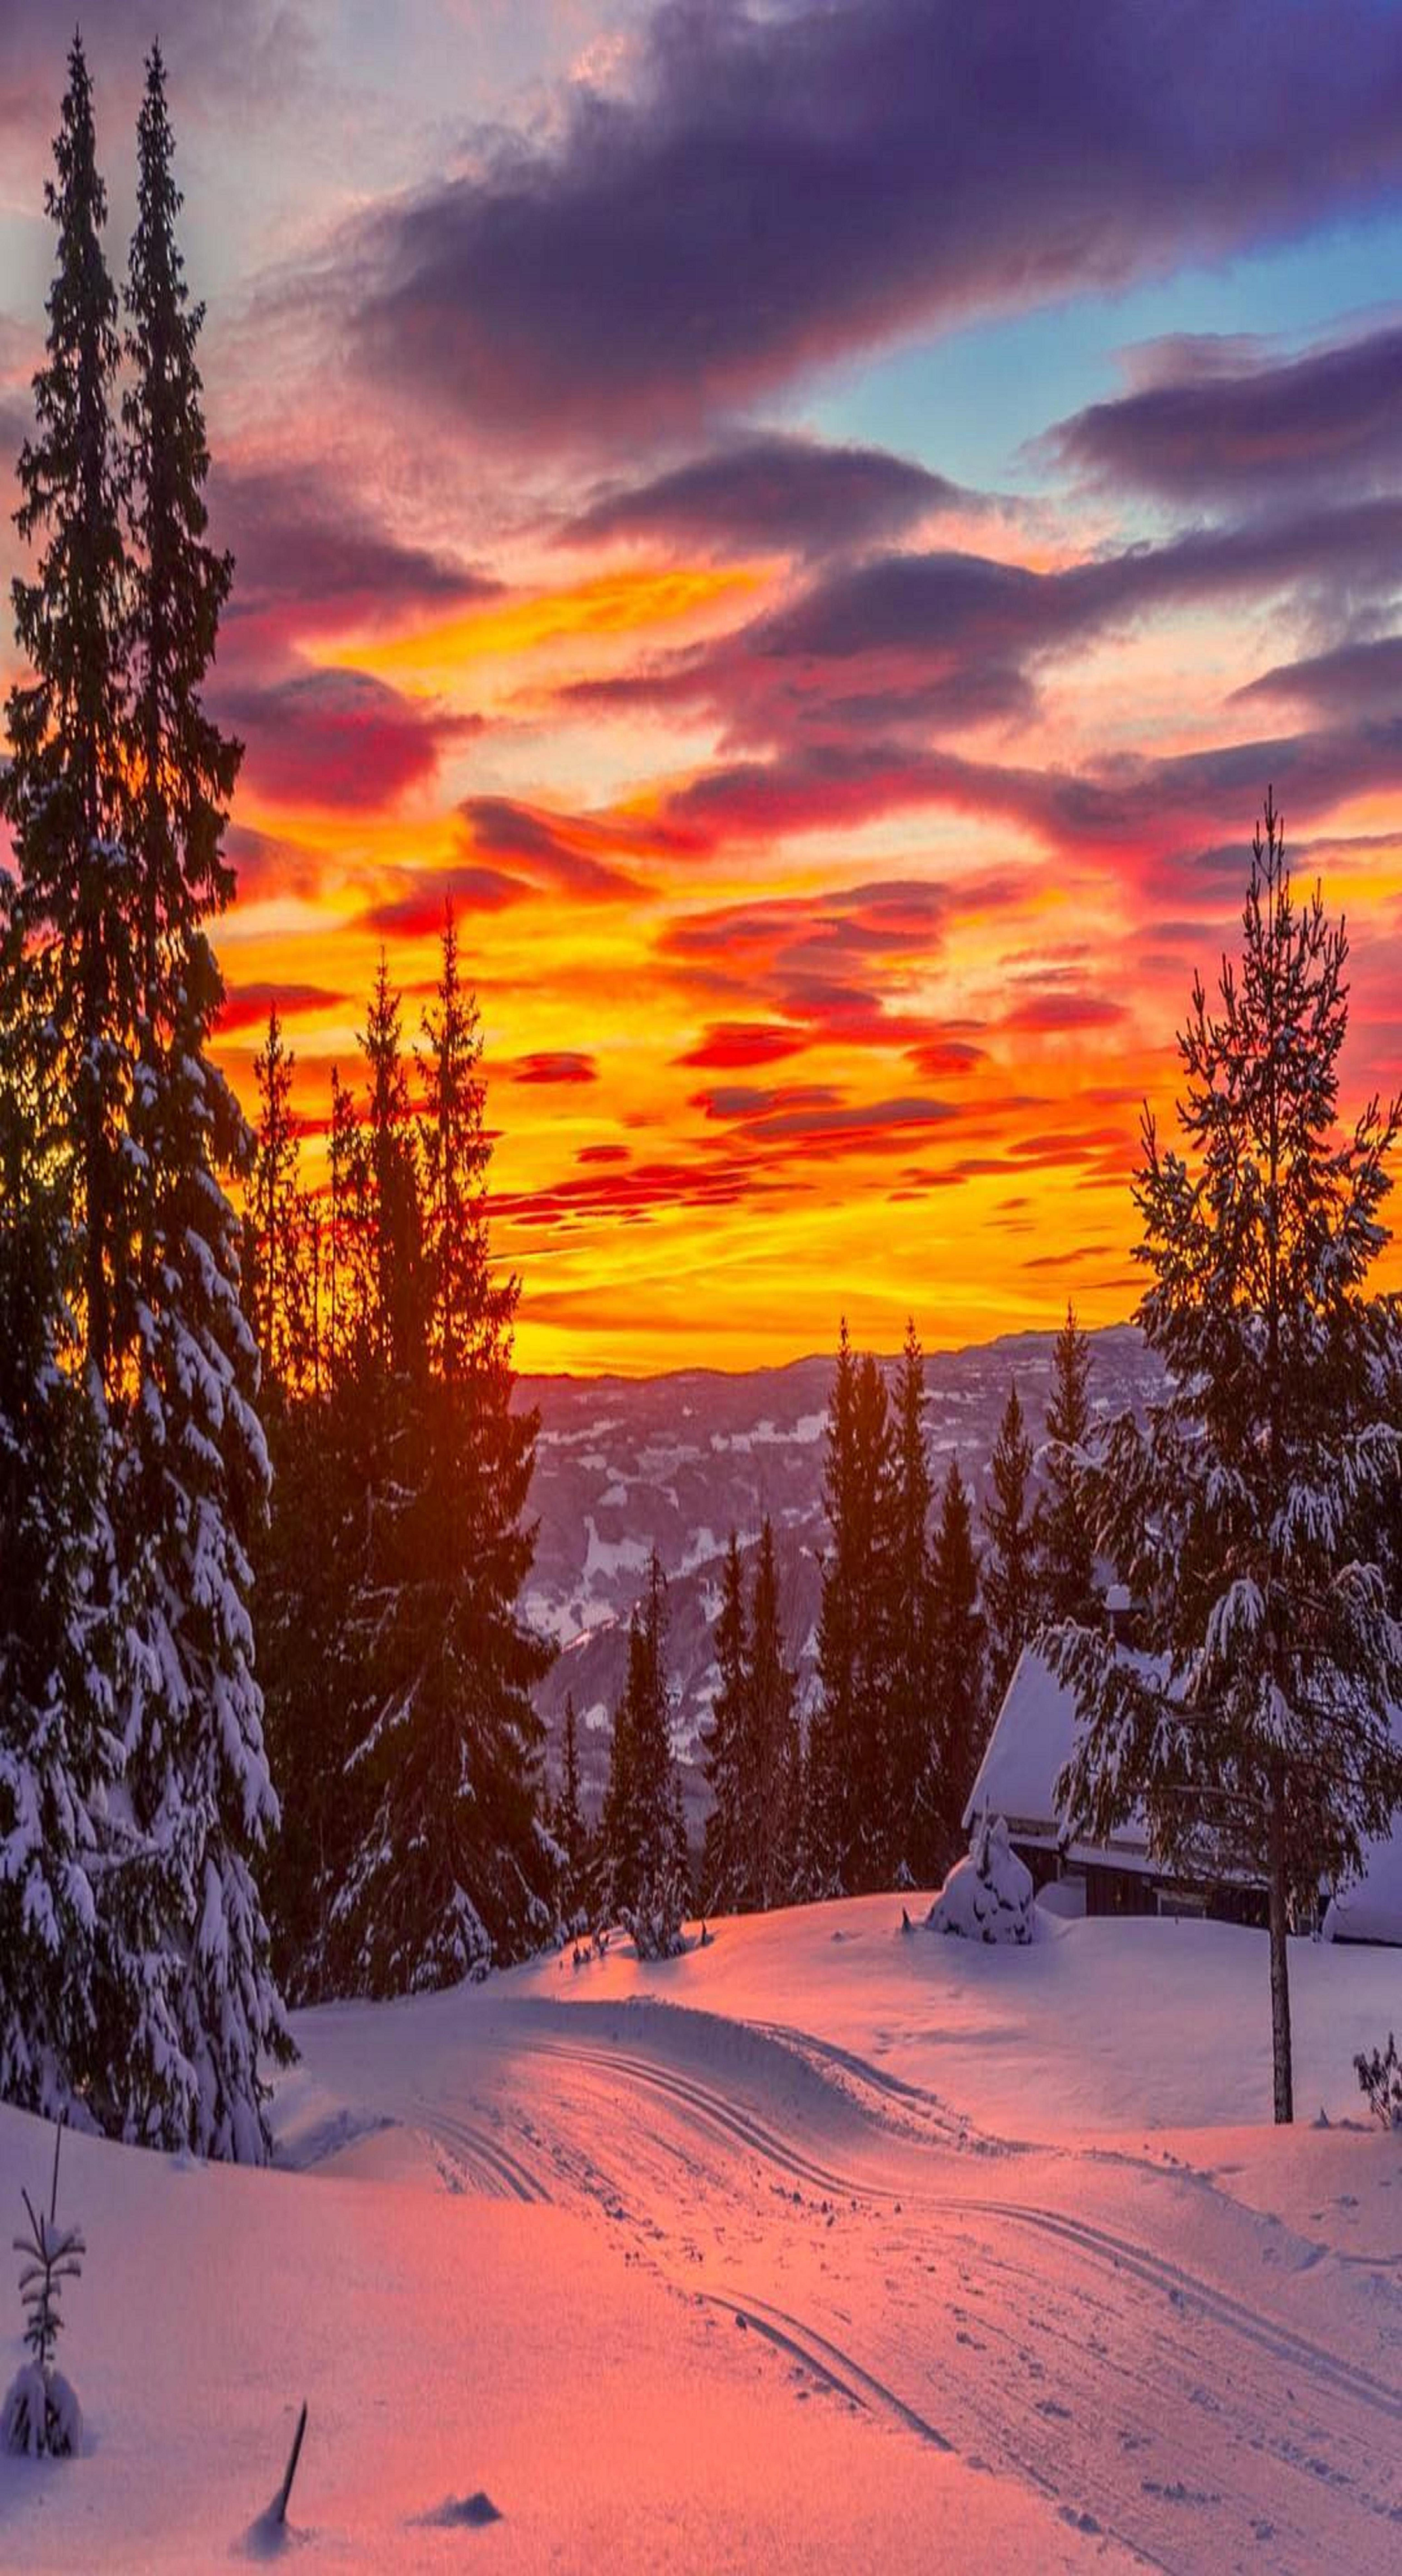 Pin By Glorianne Ljubich Design On Sunset Winter Scenery Winter Landscape Winter Photography